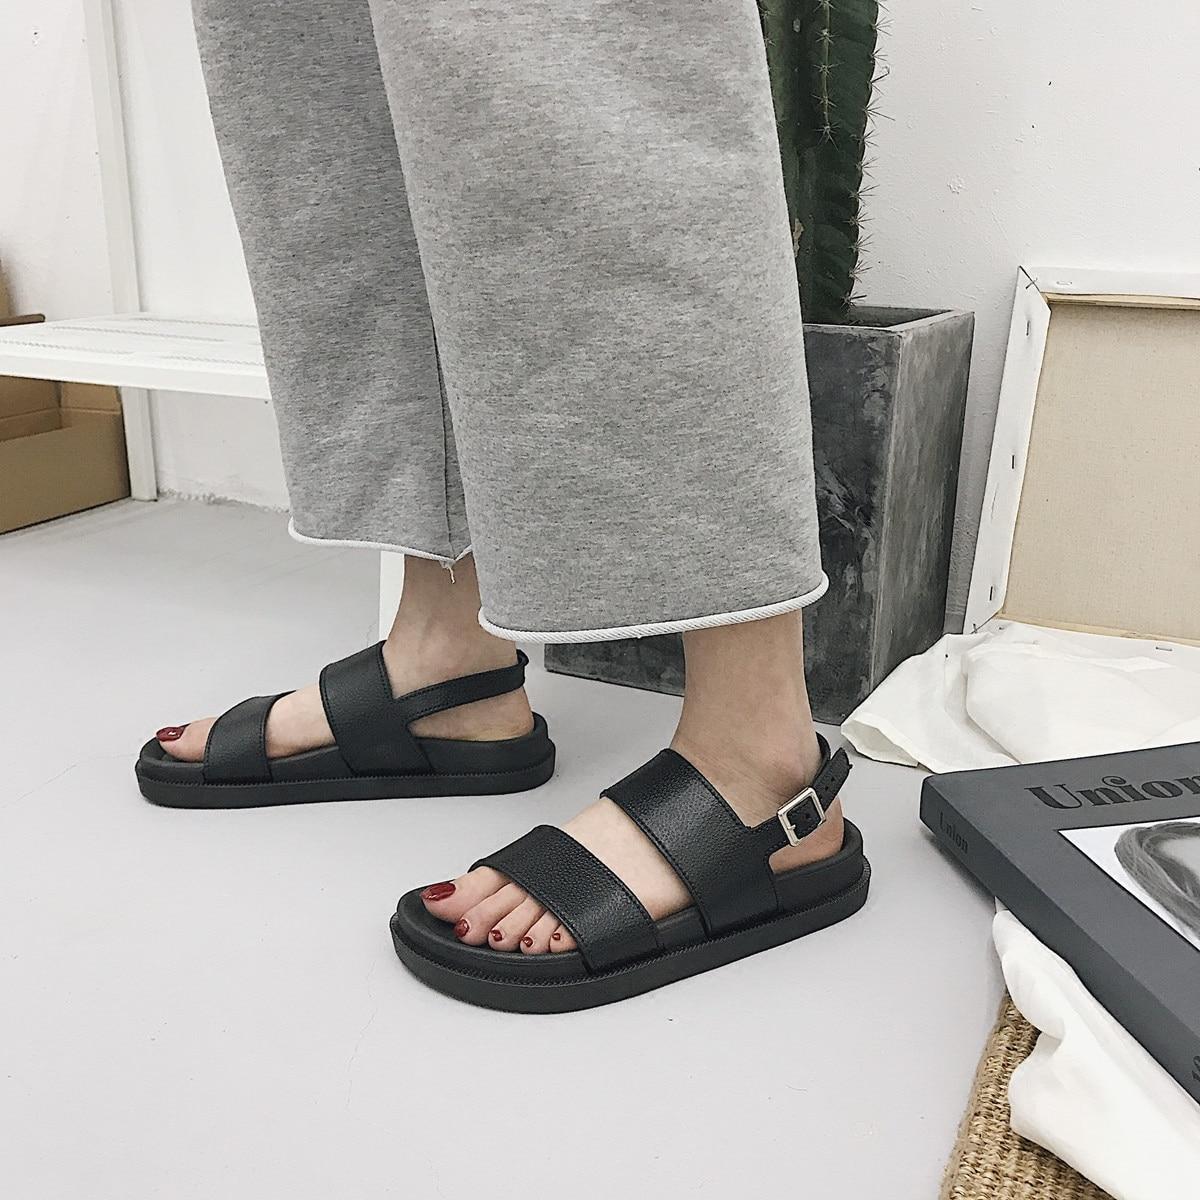 Mazefeng 2018 New Fshion Summer Women Shoes Rome Style Women Casual Sandals Solid Black Buckle Ladies Innrech Market.com